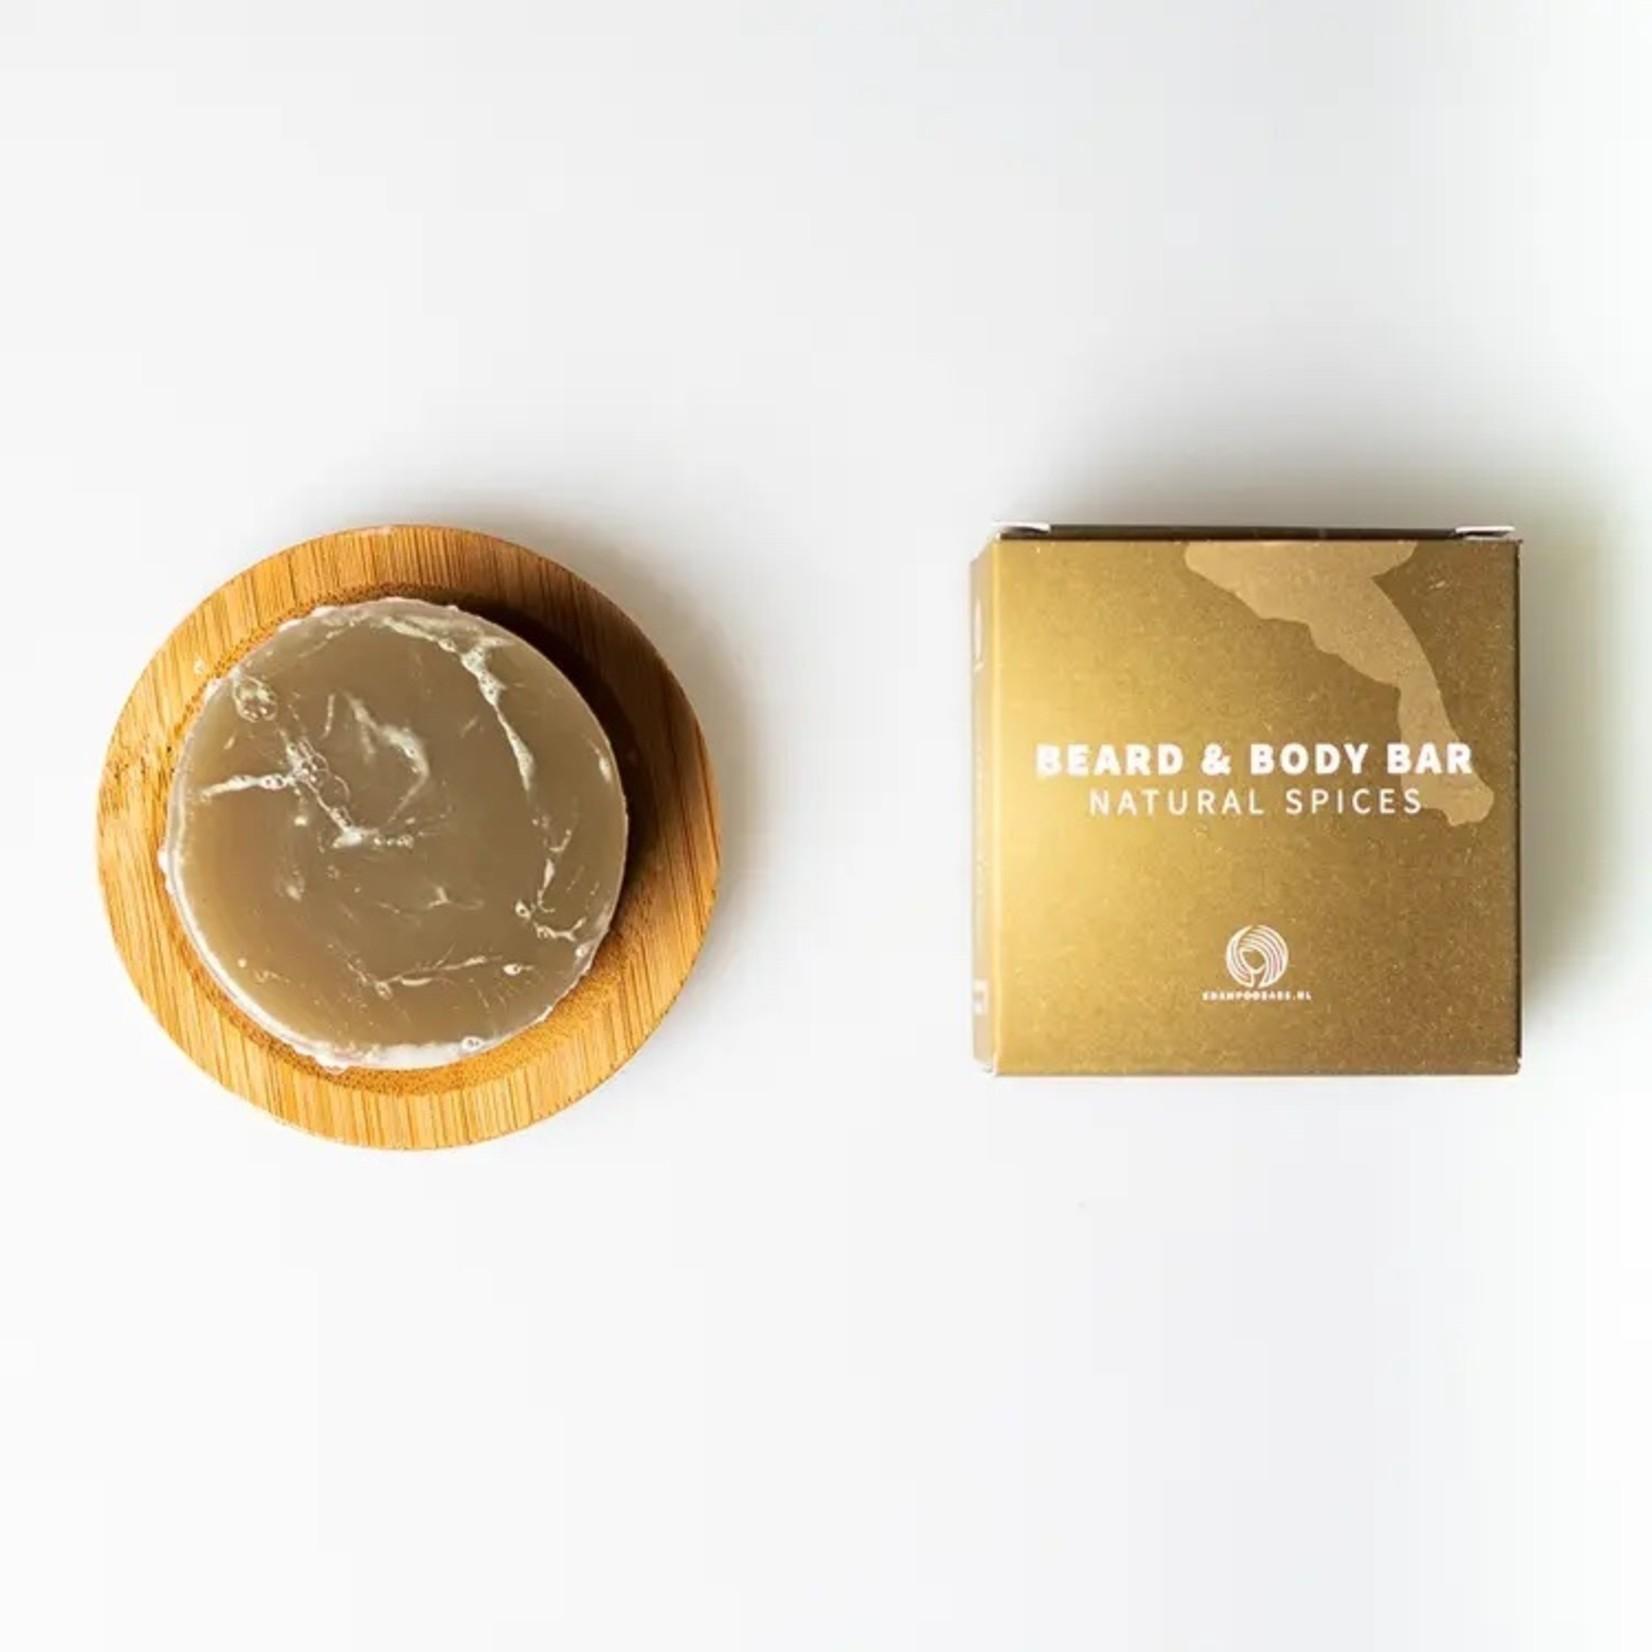 Baard & Body Bar natural spices